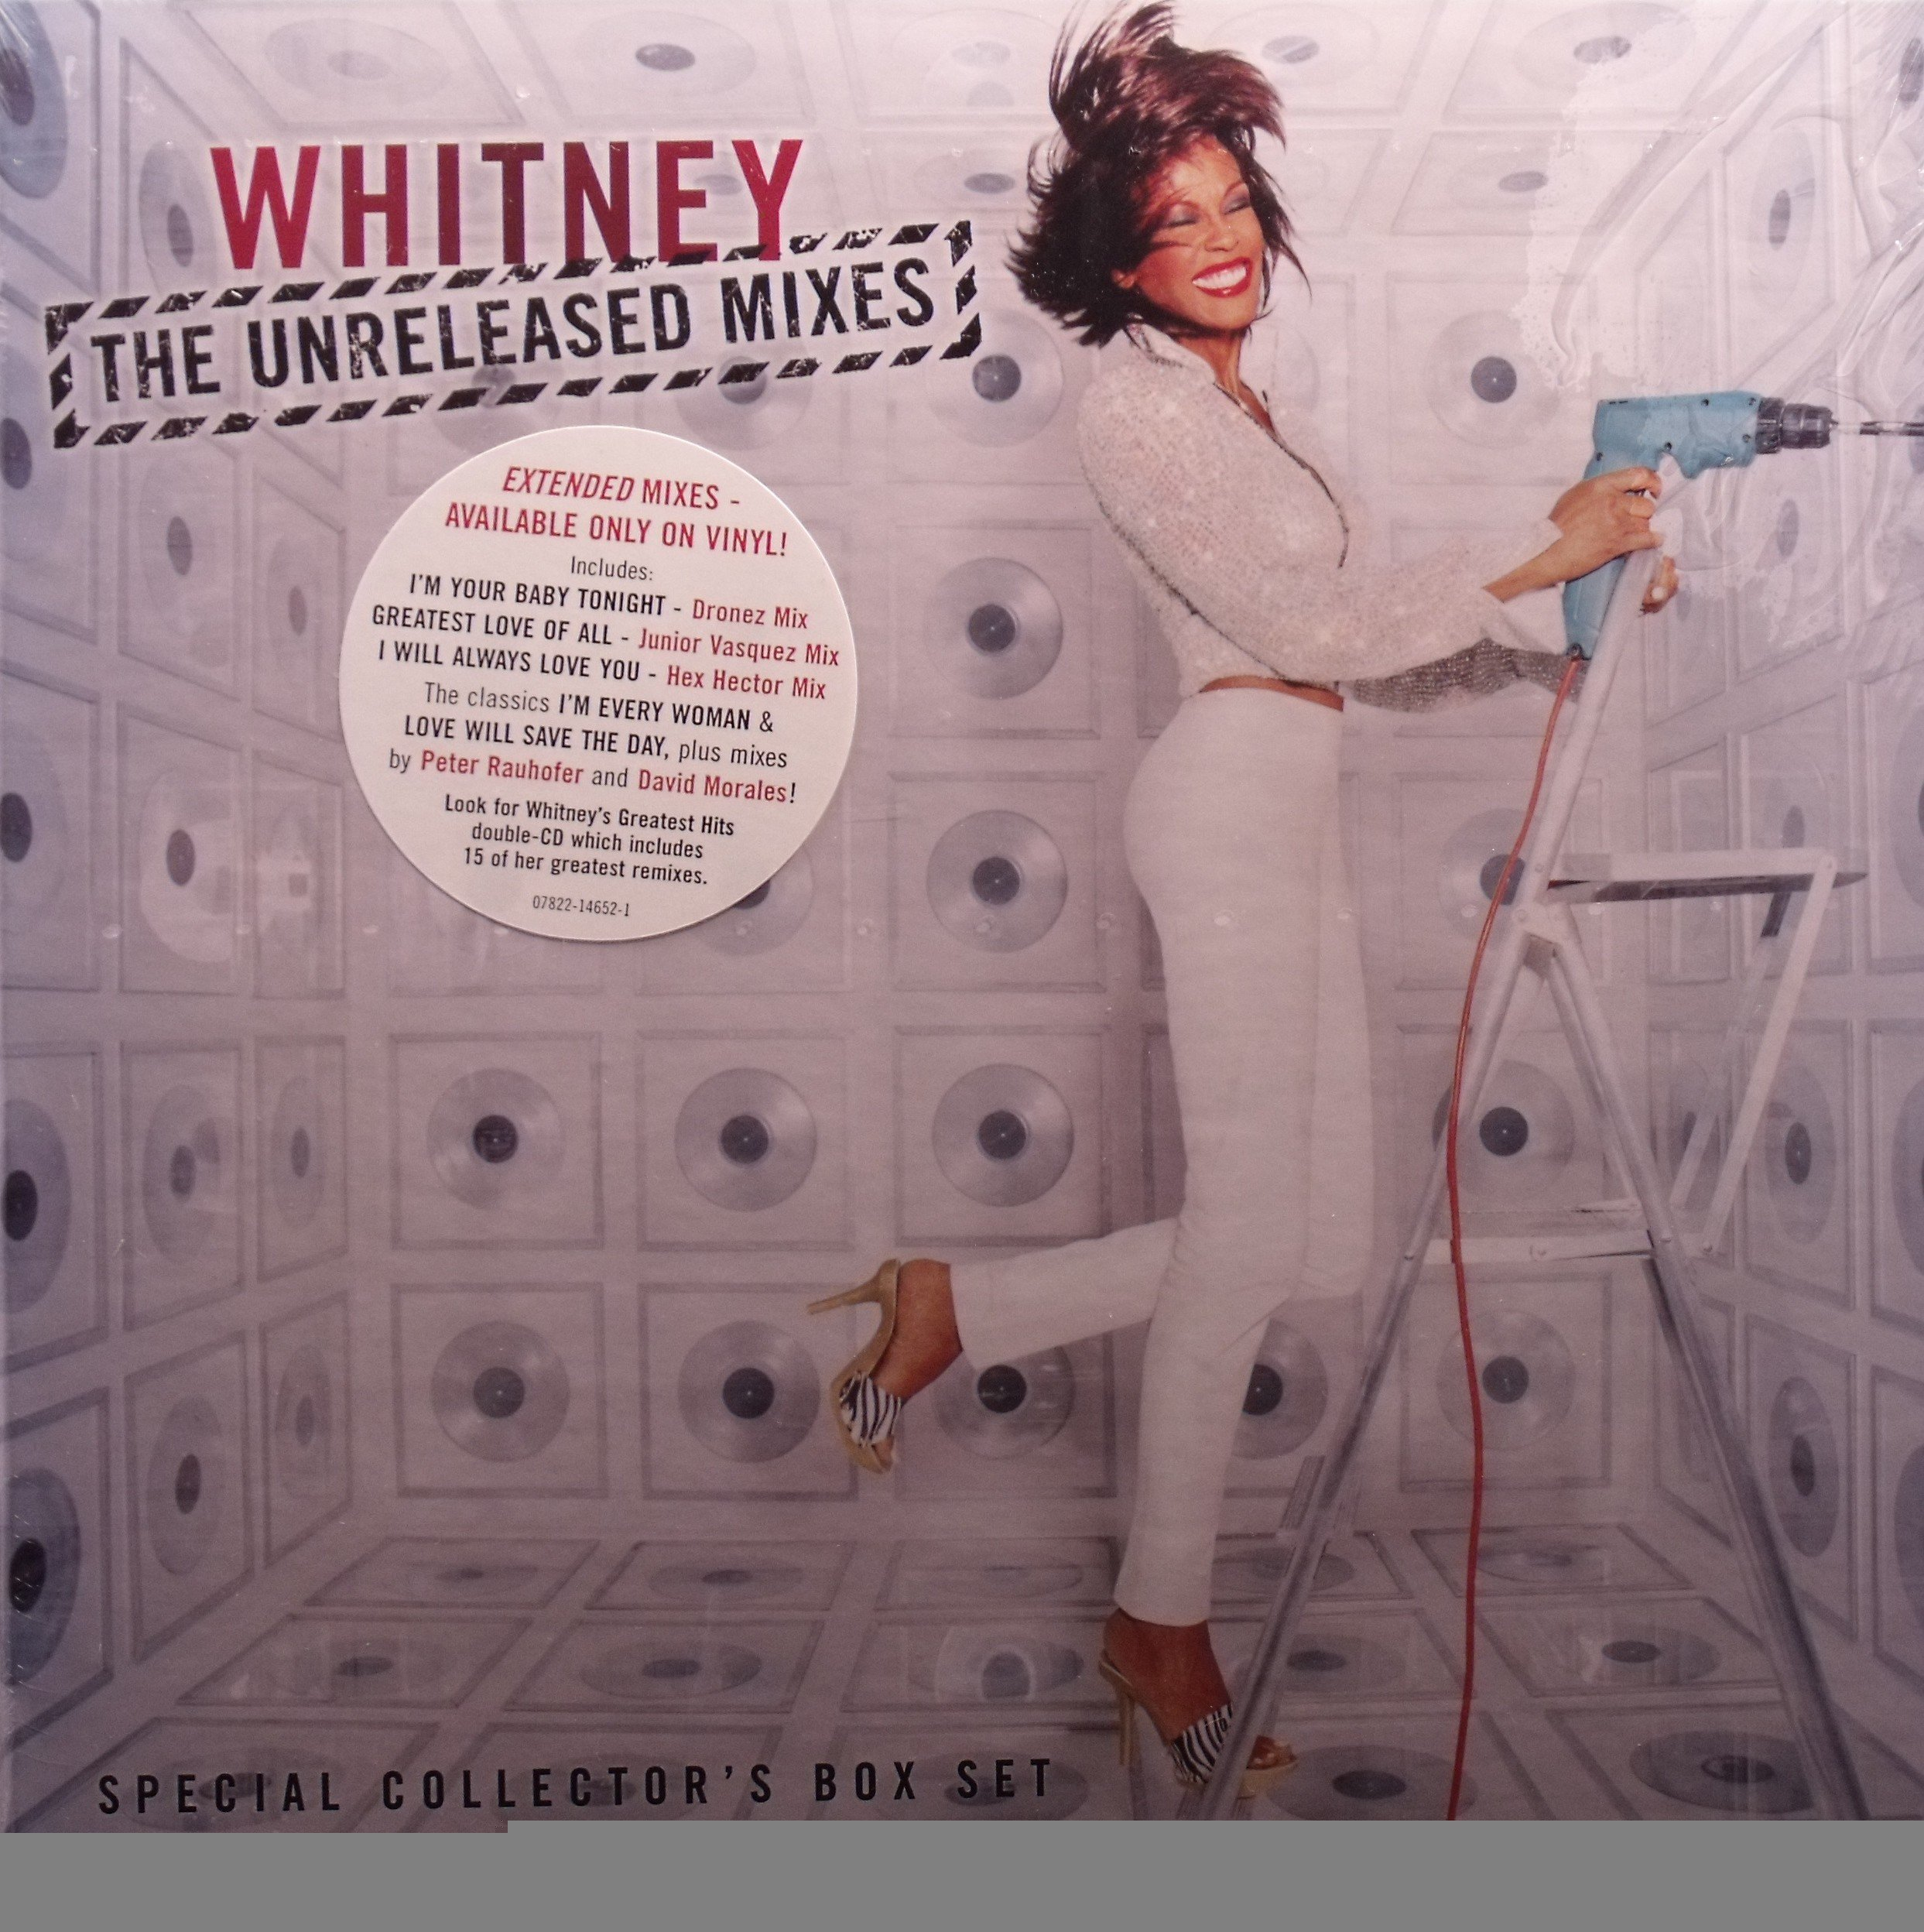 The Unreleased Mixes [Vinyl] by Arista